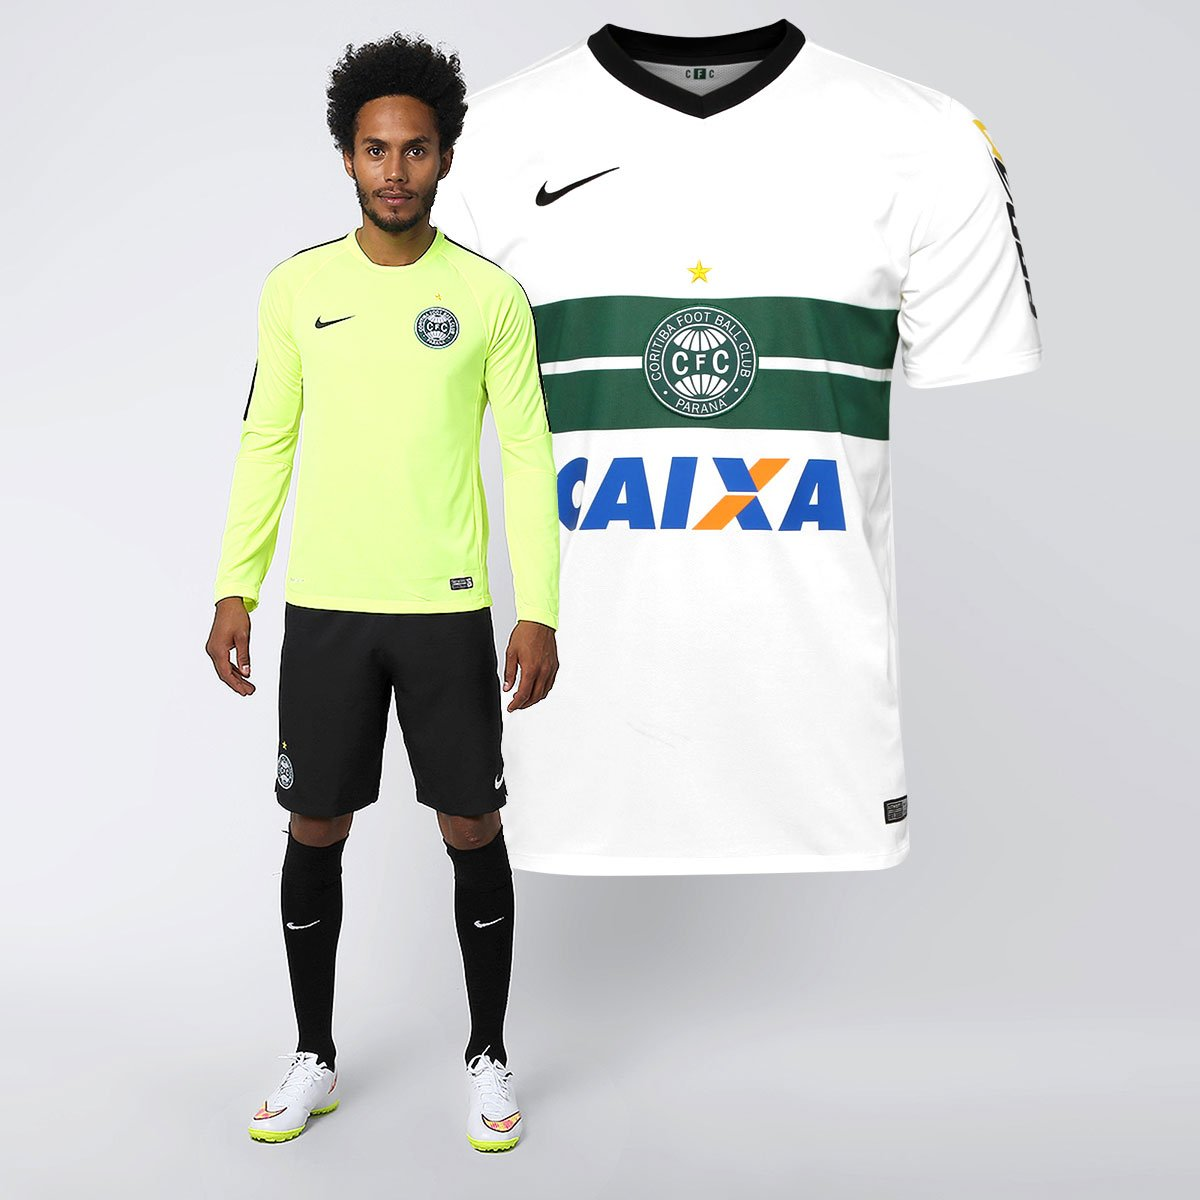 Kit Nike Coritiba - Camisa I 14 15 s nº + Camisa Treino M L - Compre Agora   32bdbc0cc195b